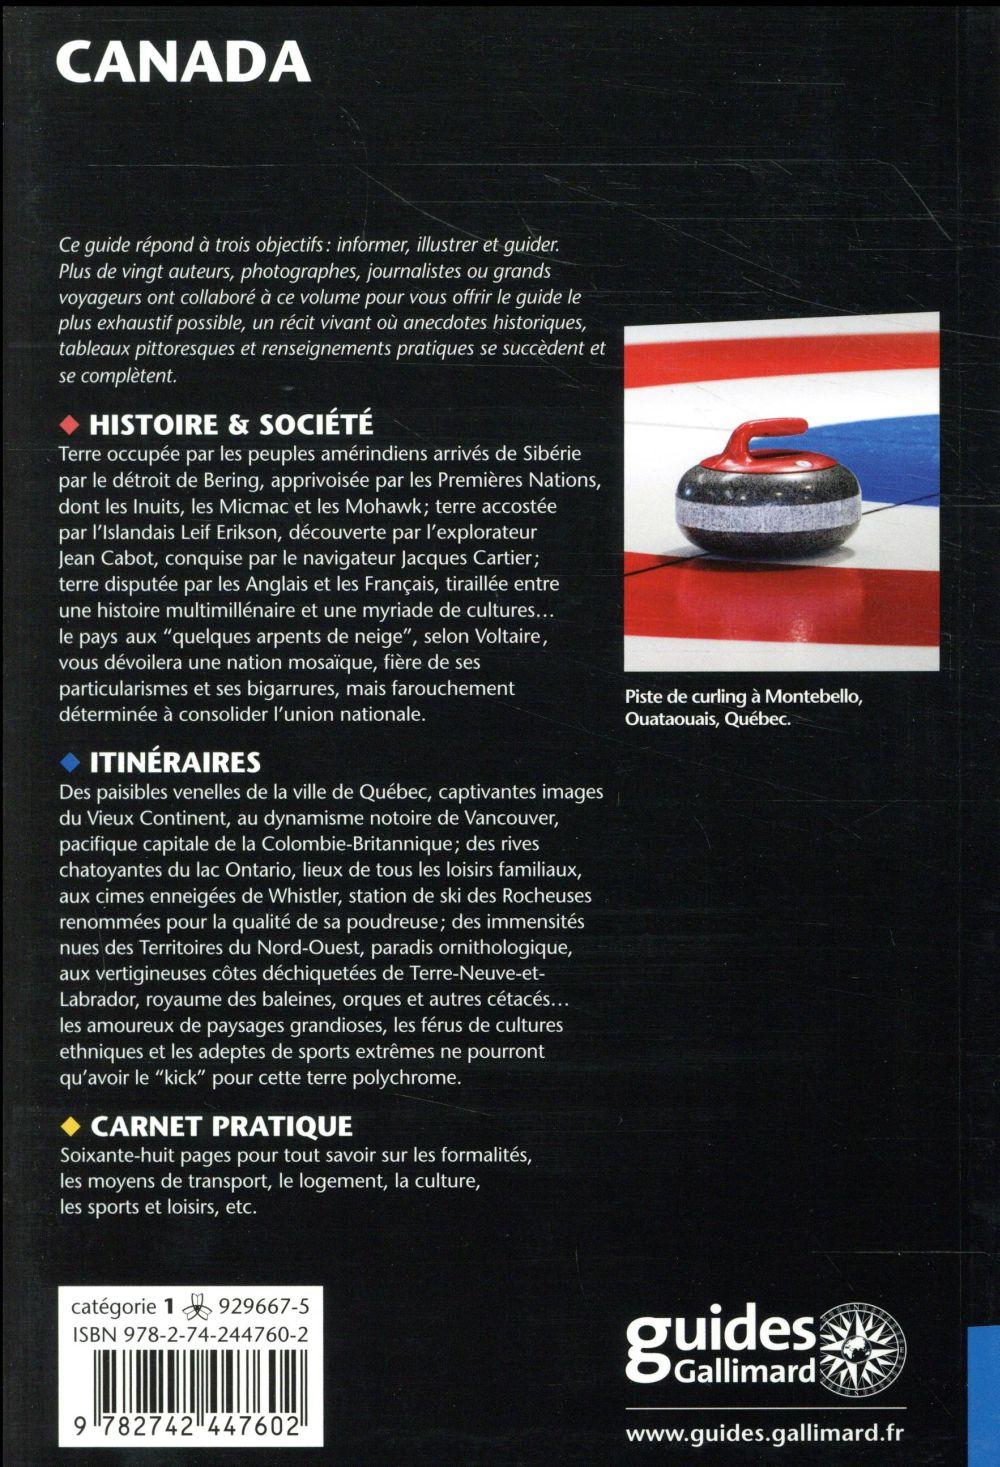 Canada (édition 2017)